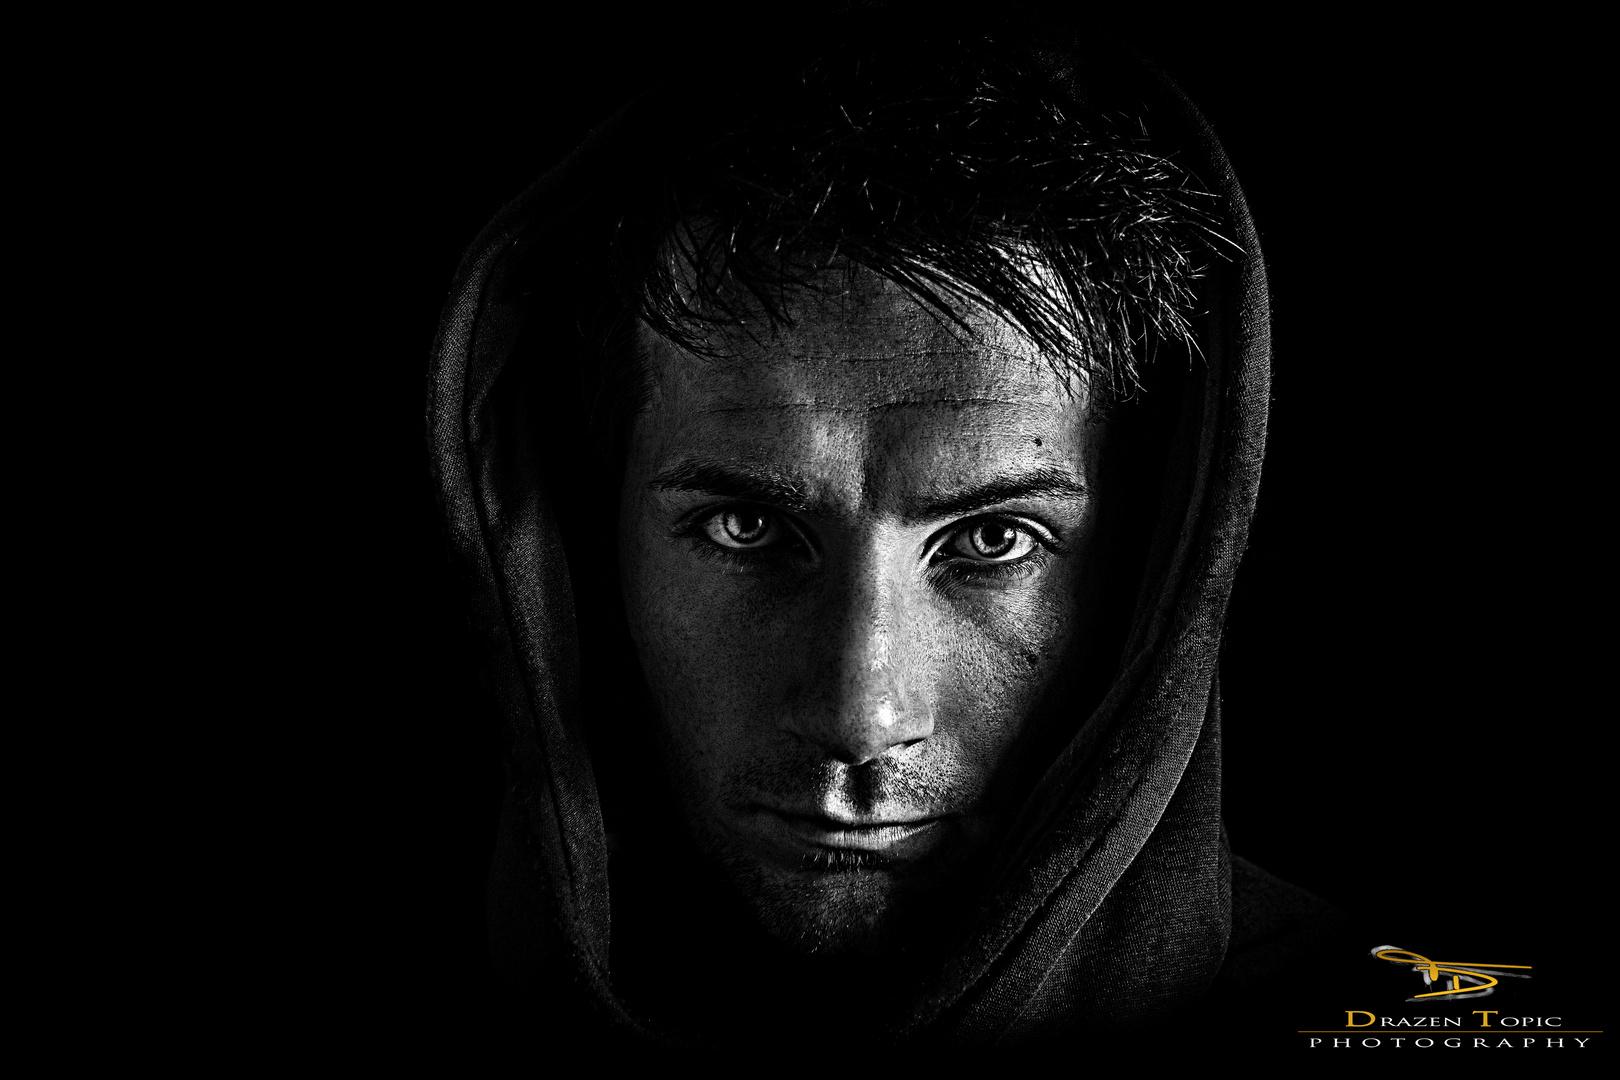 Selbst Portrait - Persian